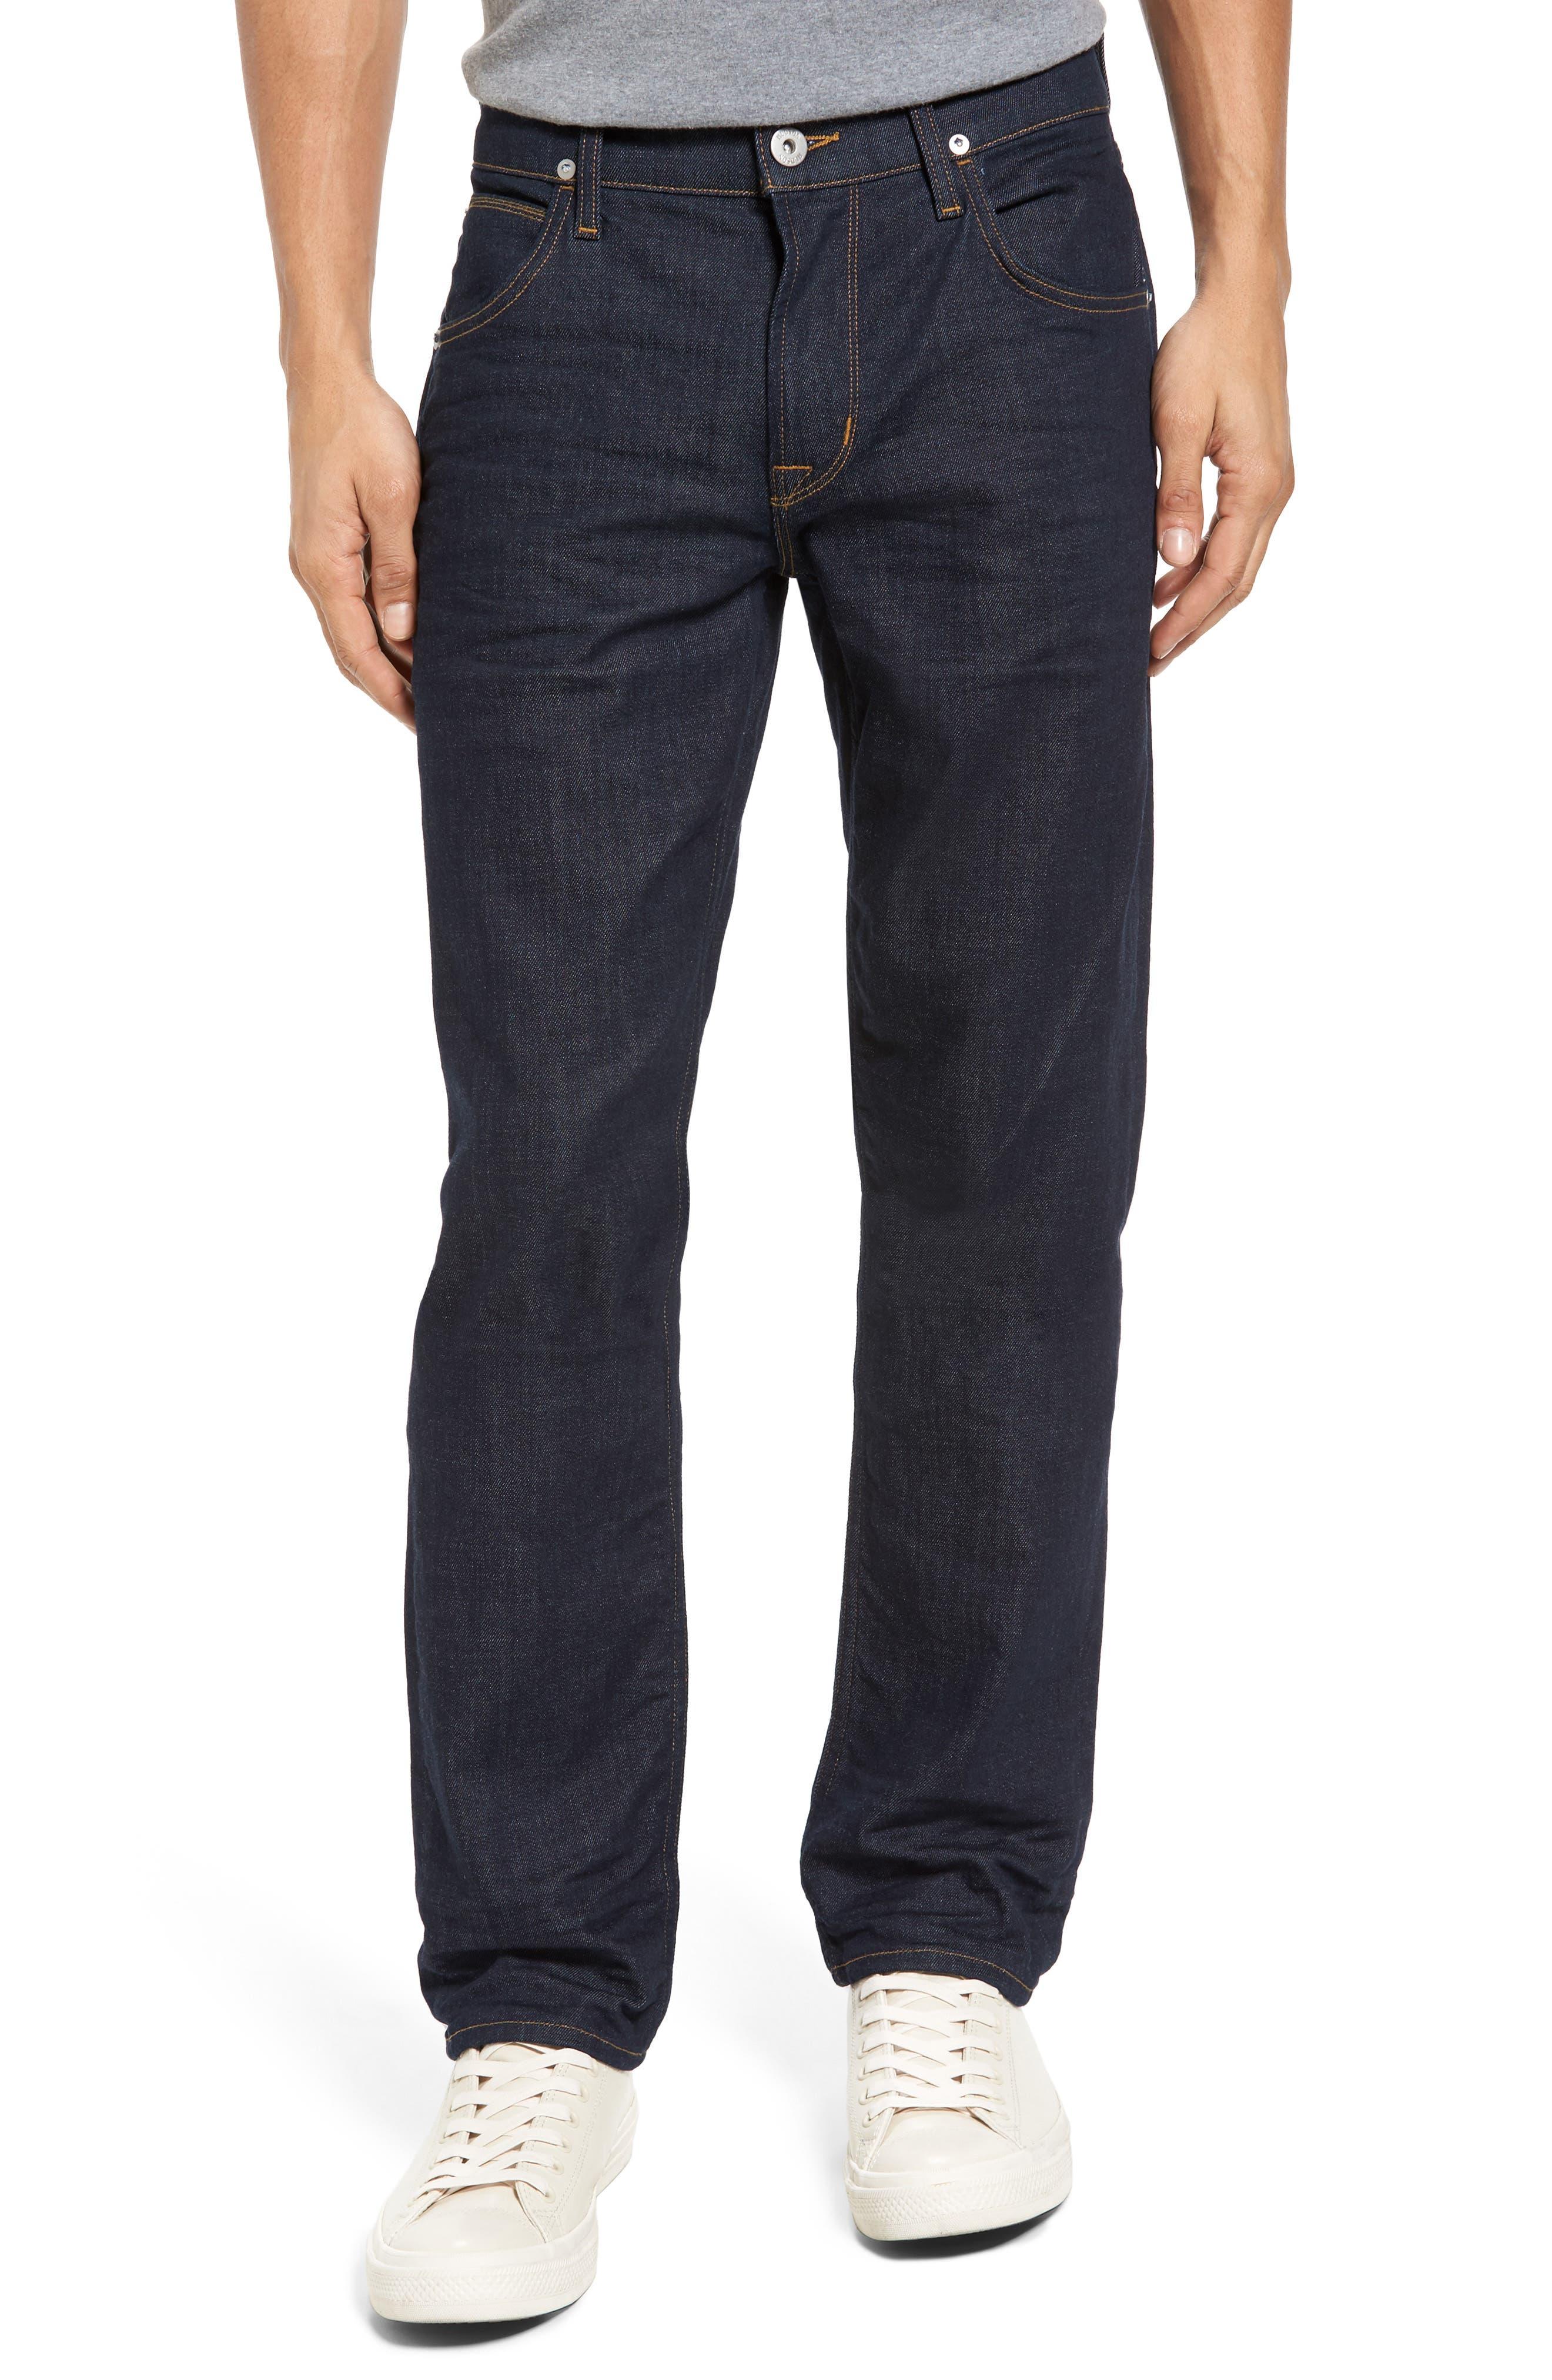 Blake Slim Fit Jeans,                             Main thumbnail 1, color,                             410